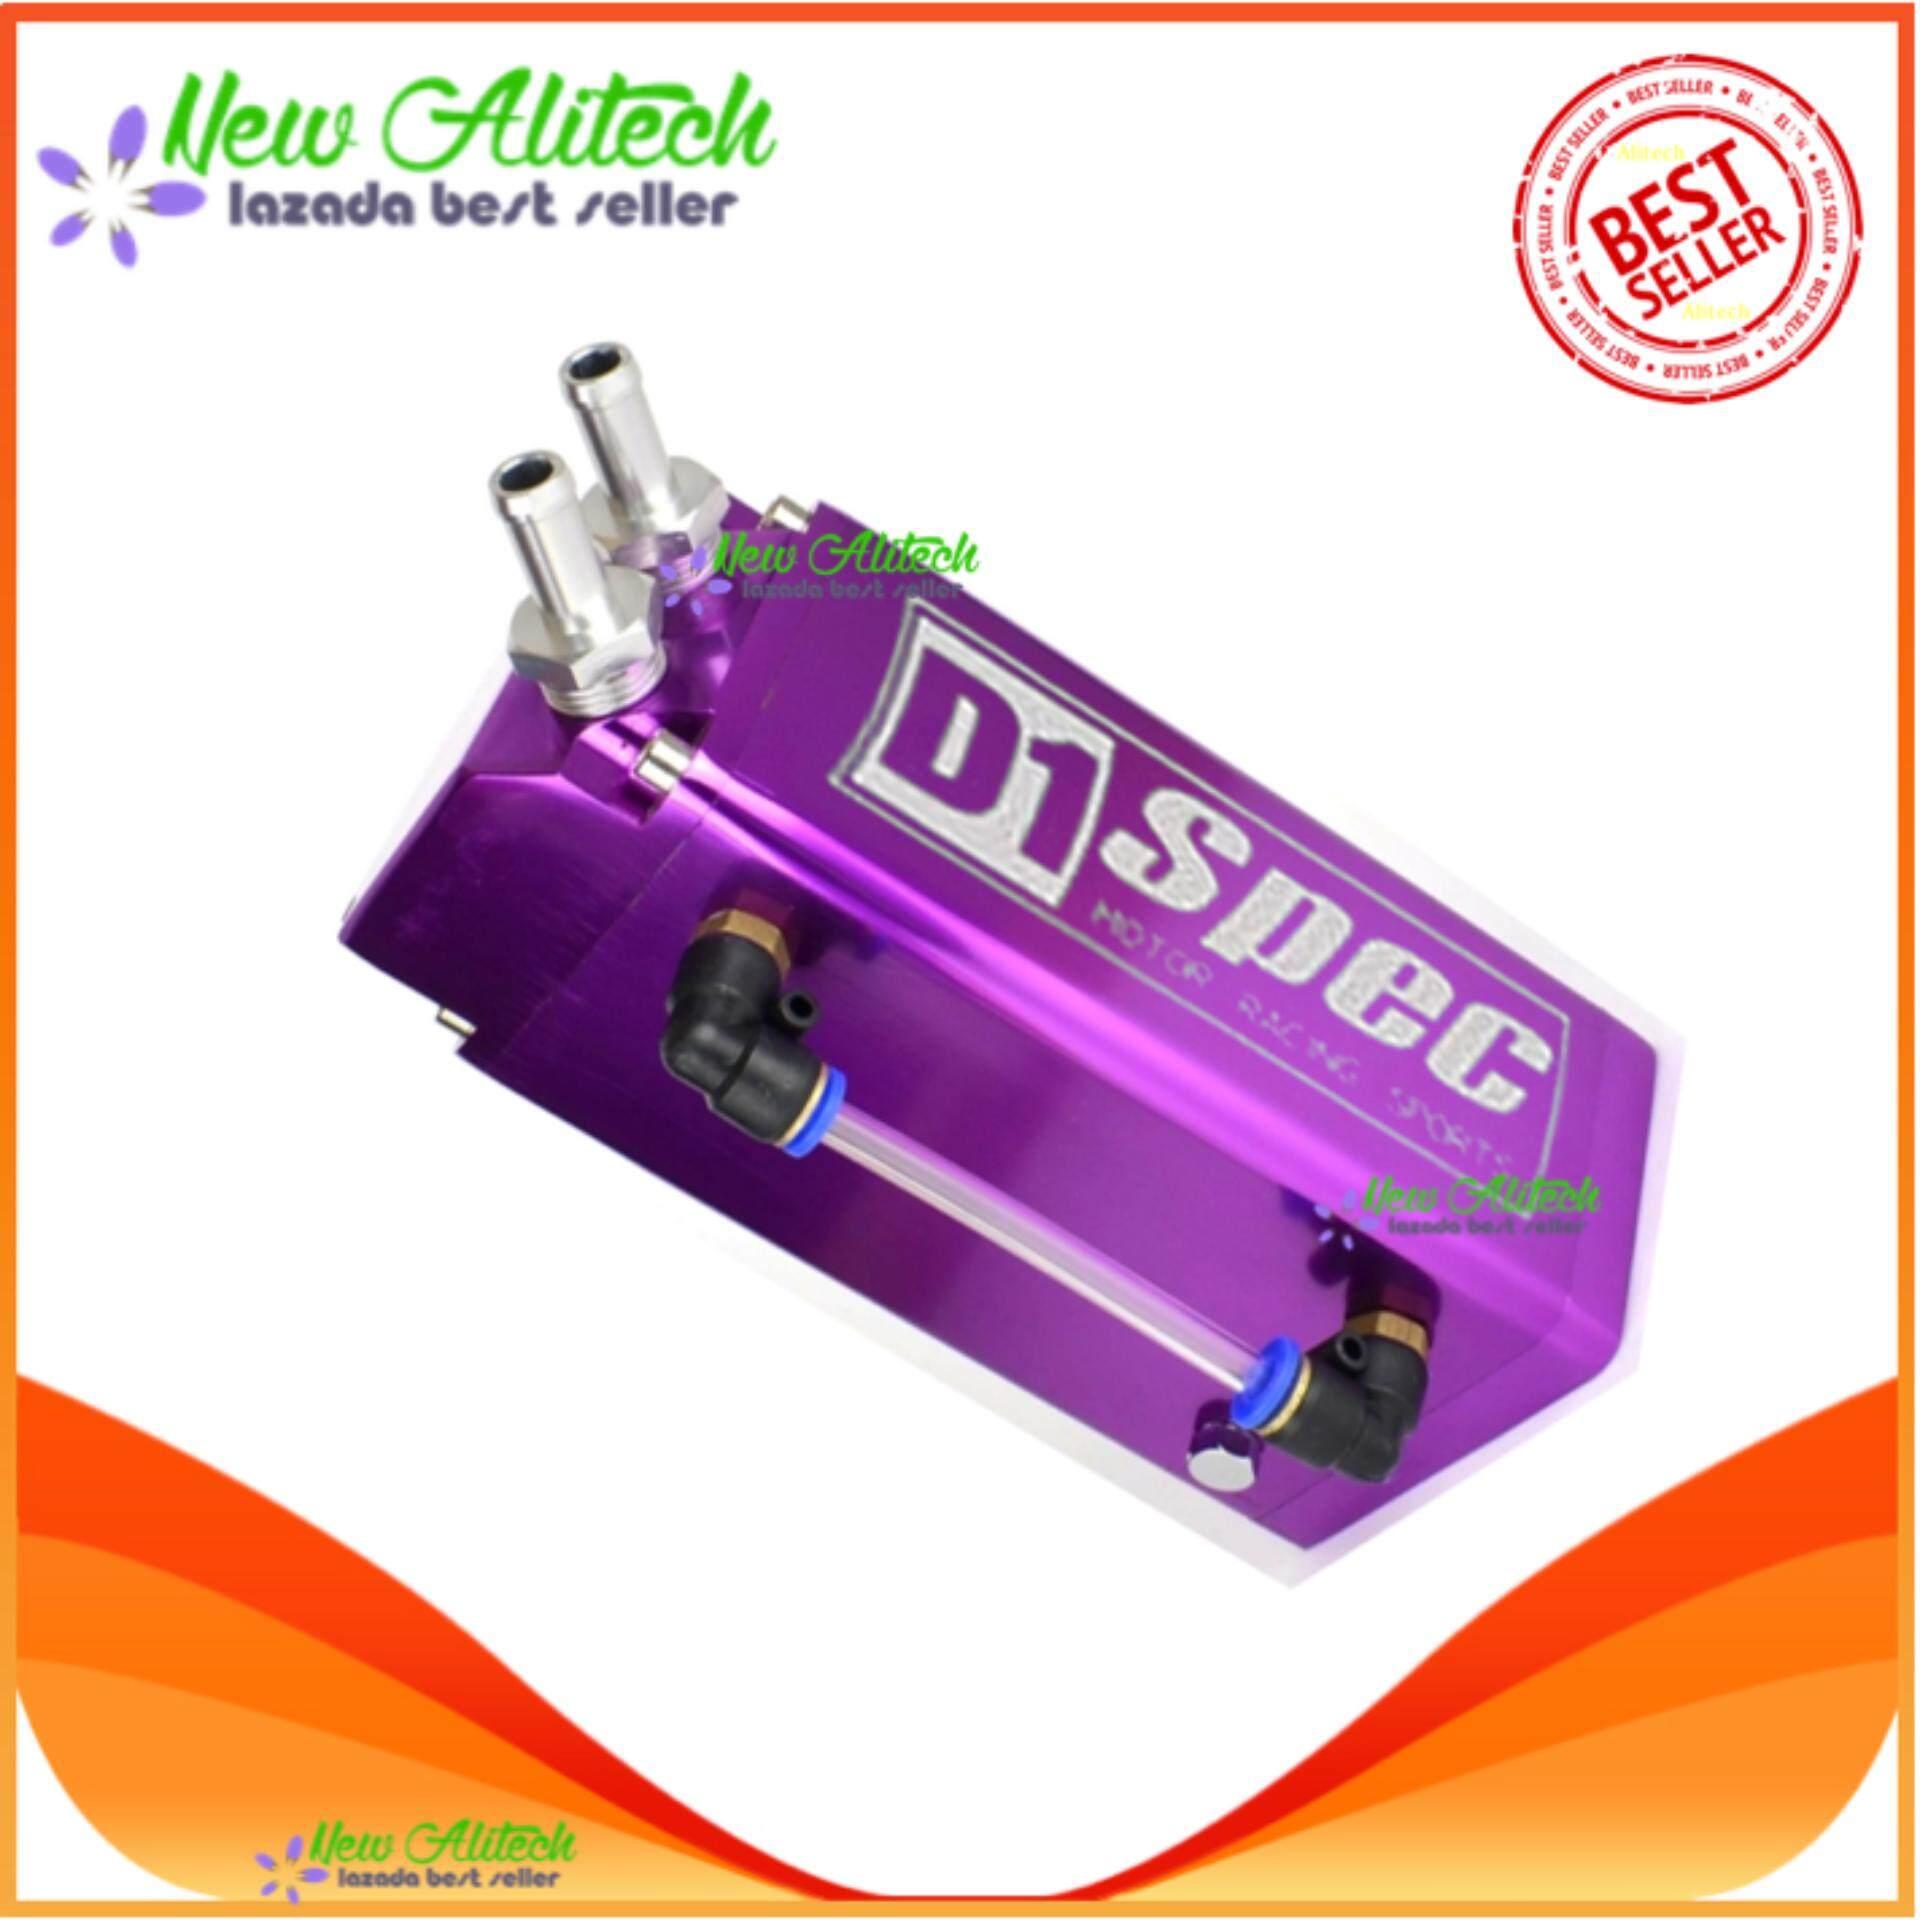 New Alitech D1 ถังดักไอน้ำมันเครื่อง ทรงเหลี่ยม (สีม่วง) By New Alitech.